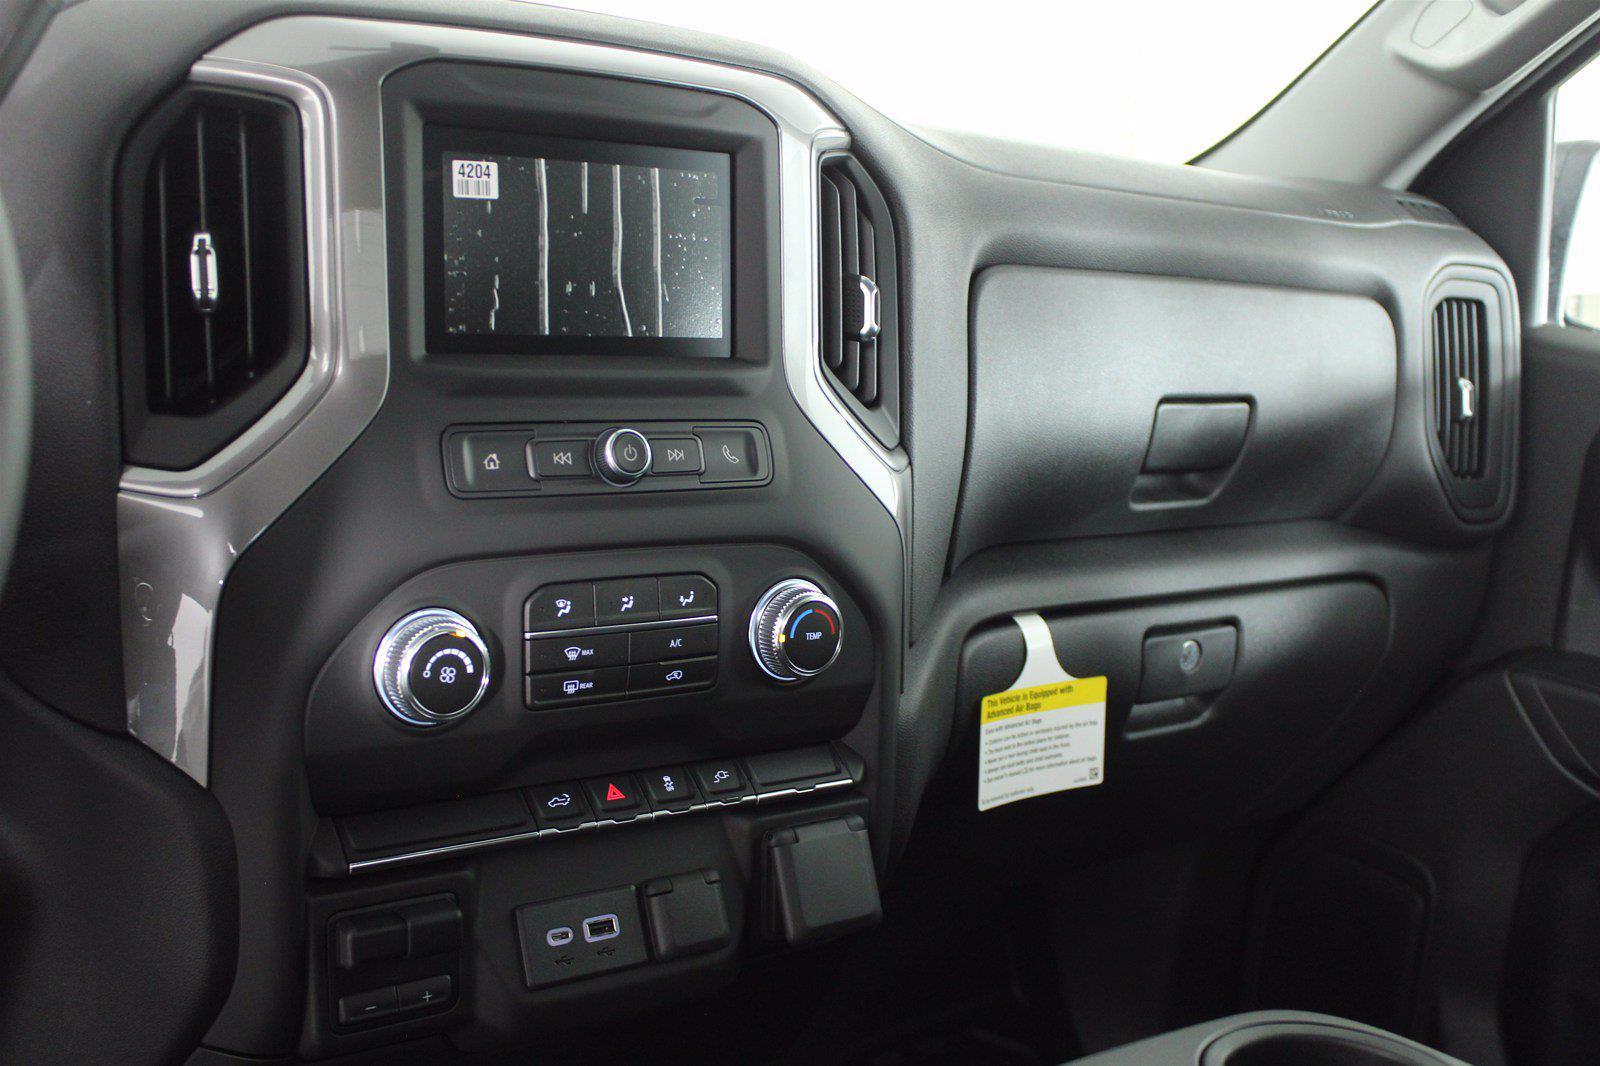 2021 GMC Sierra 1500 Regular Cab 4x4, Pickup #D411131 - photo 12